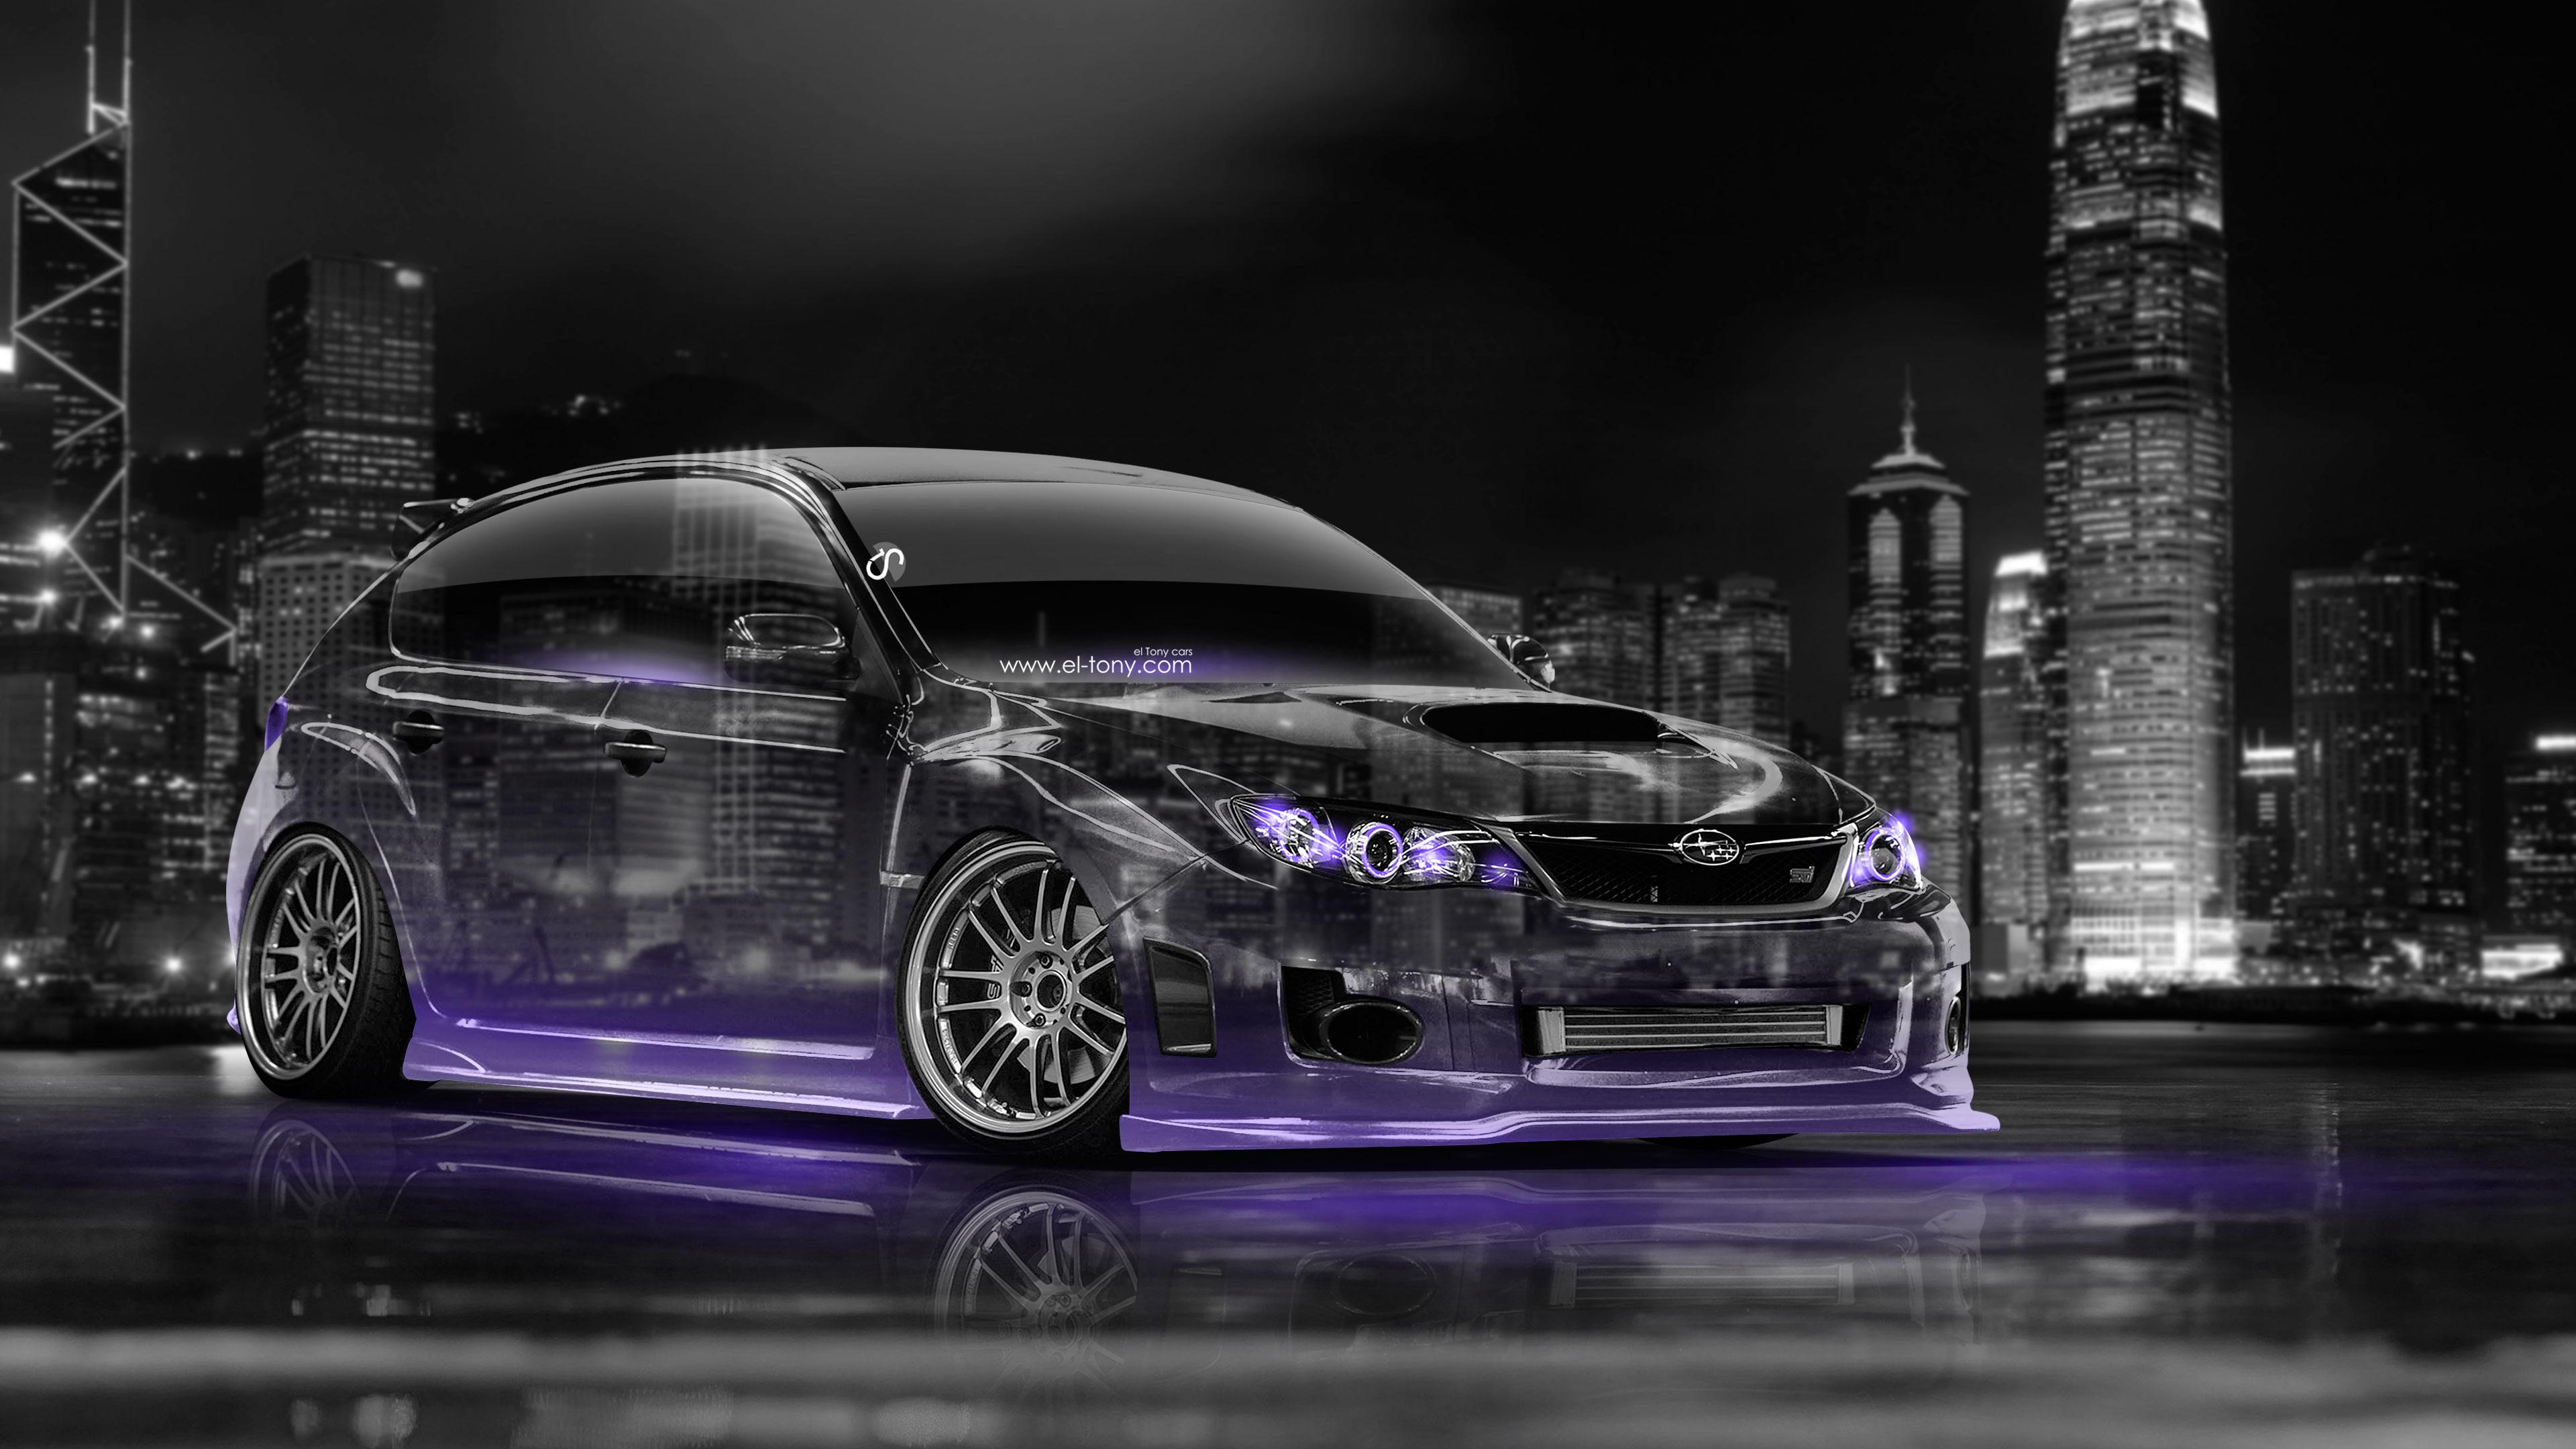 2015 Subaru Wrx Exhaust >> Subaru 4K Wallpaper - WallpaperSafari